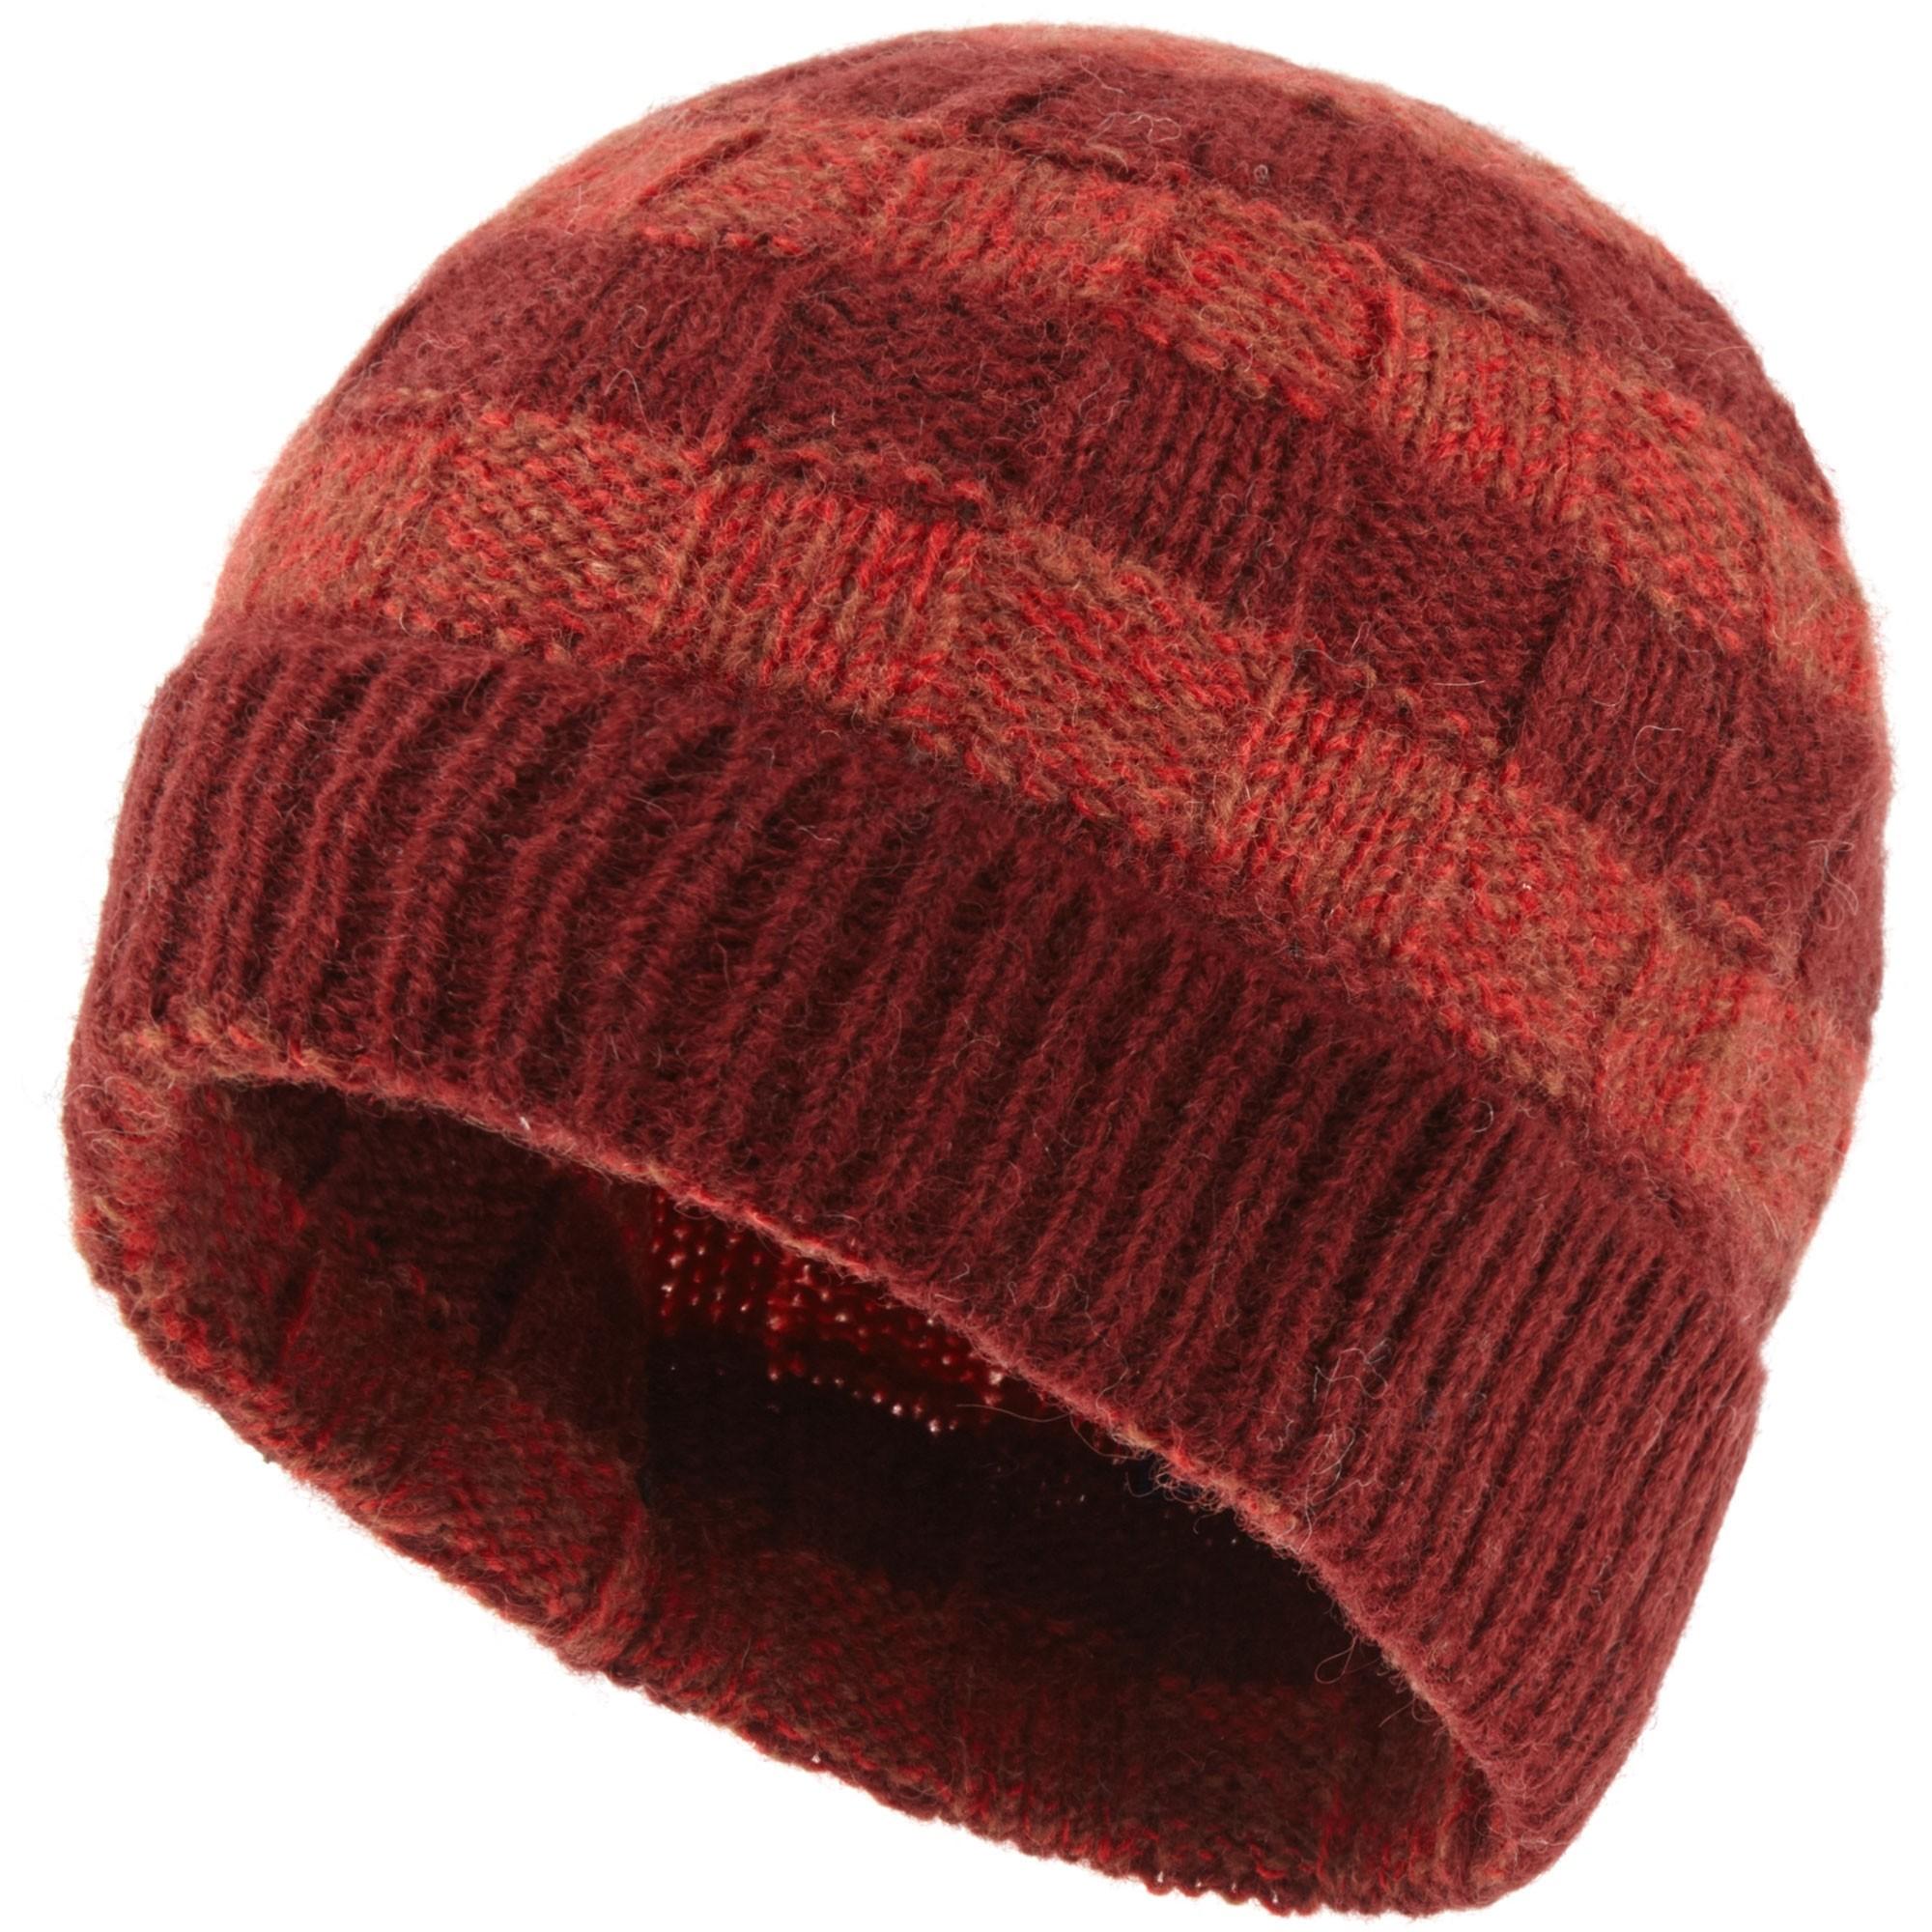 Sherpa Rishi Hatt - Potala Red